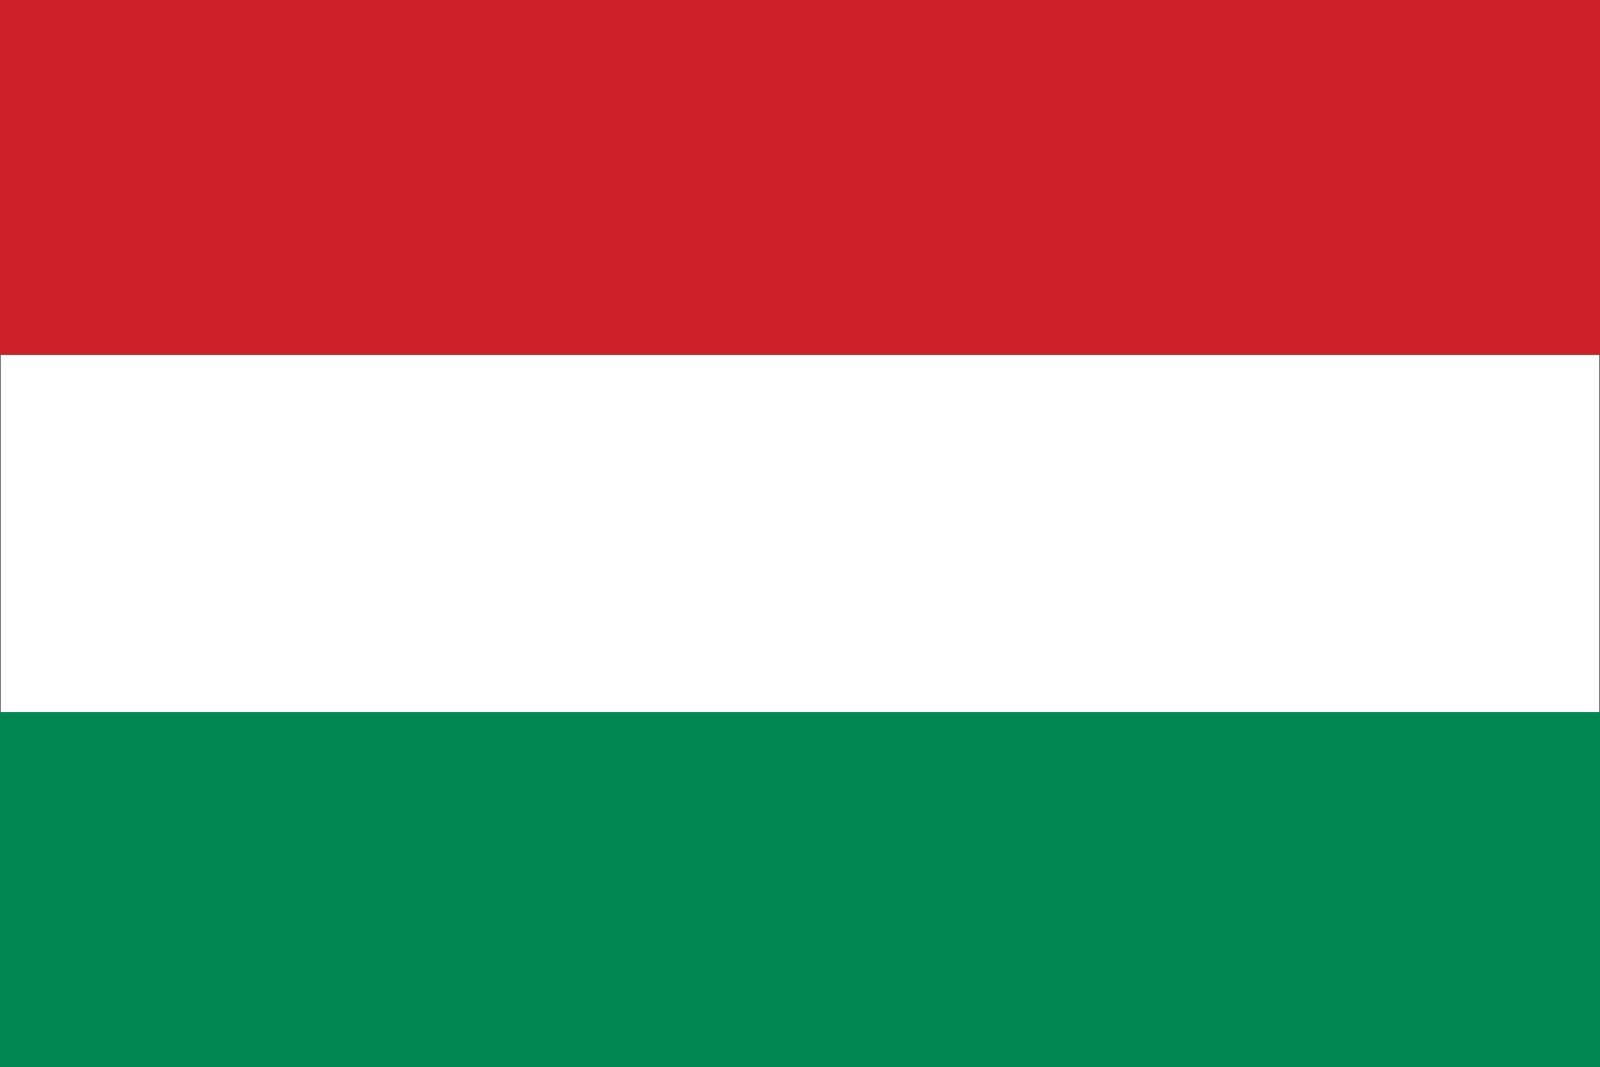 Travcour Hungary Visa Application